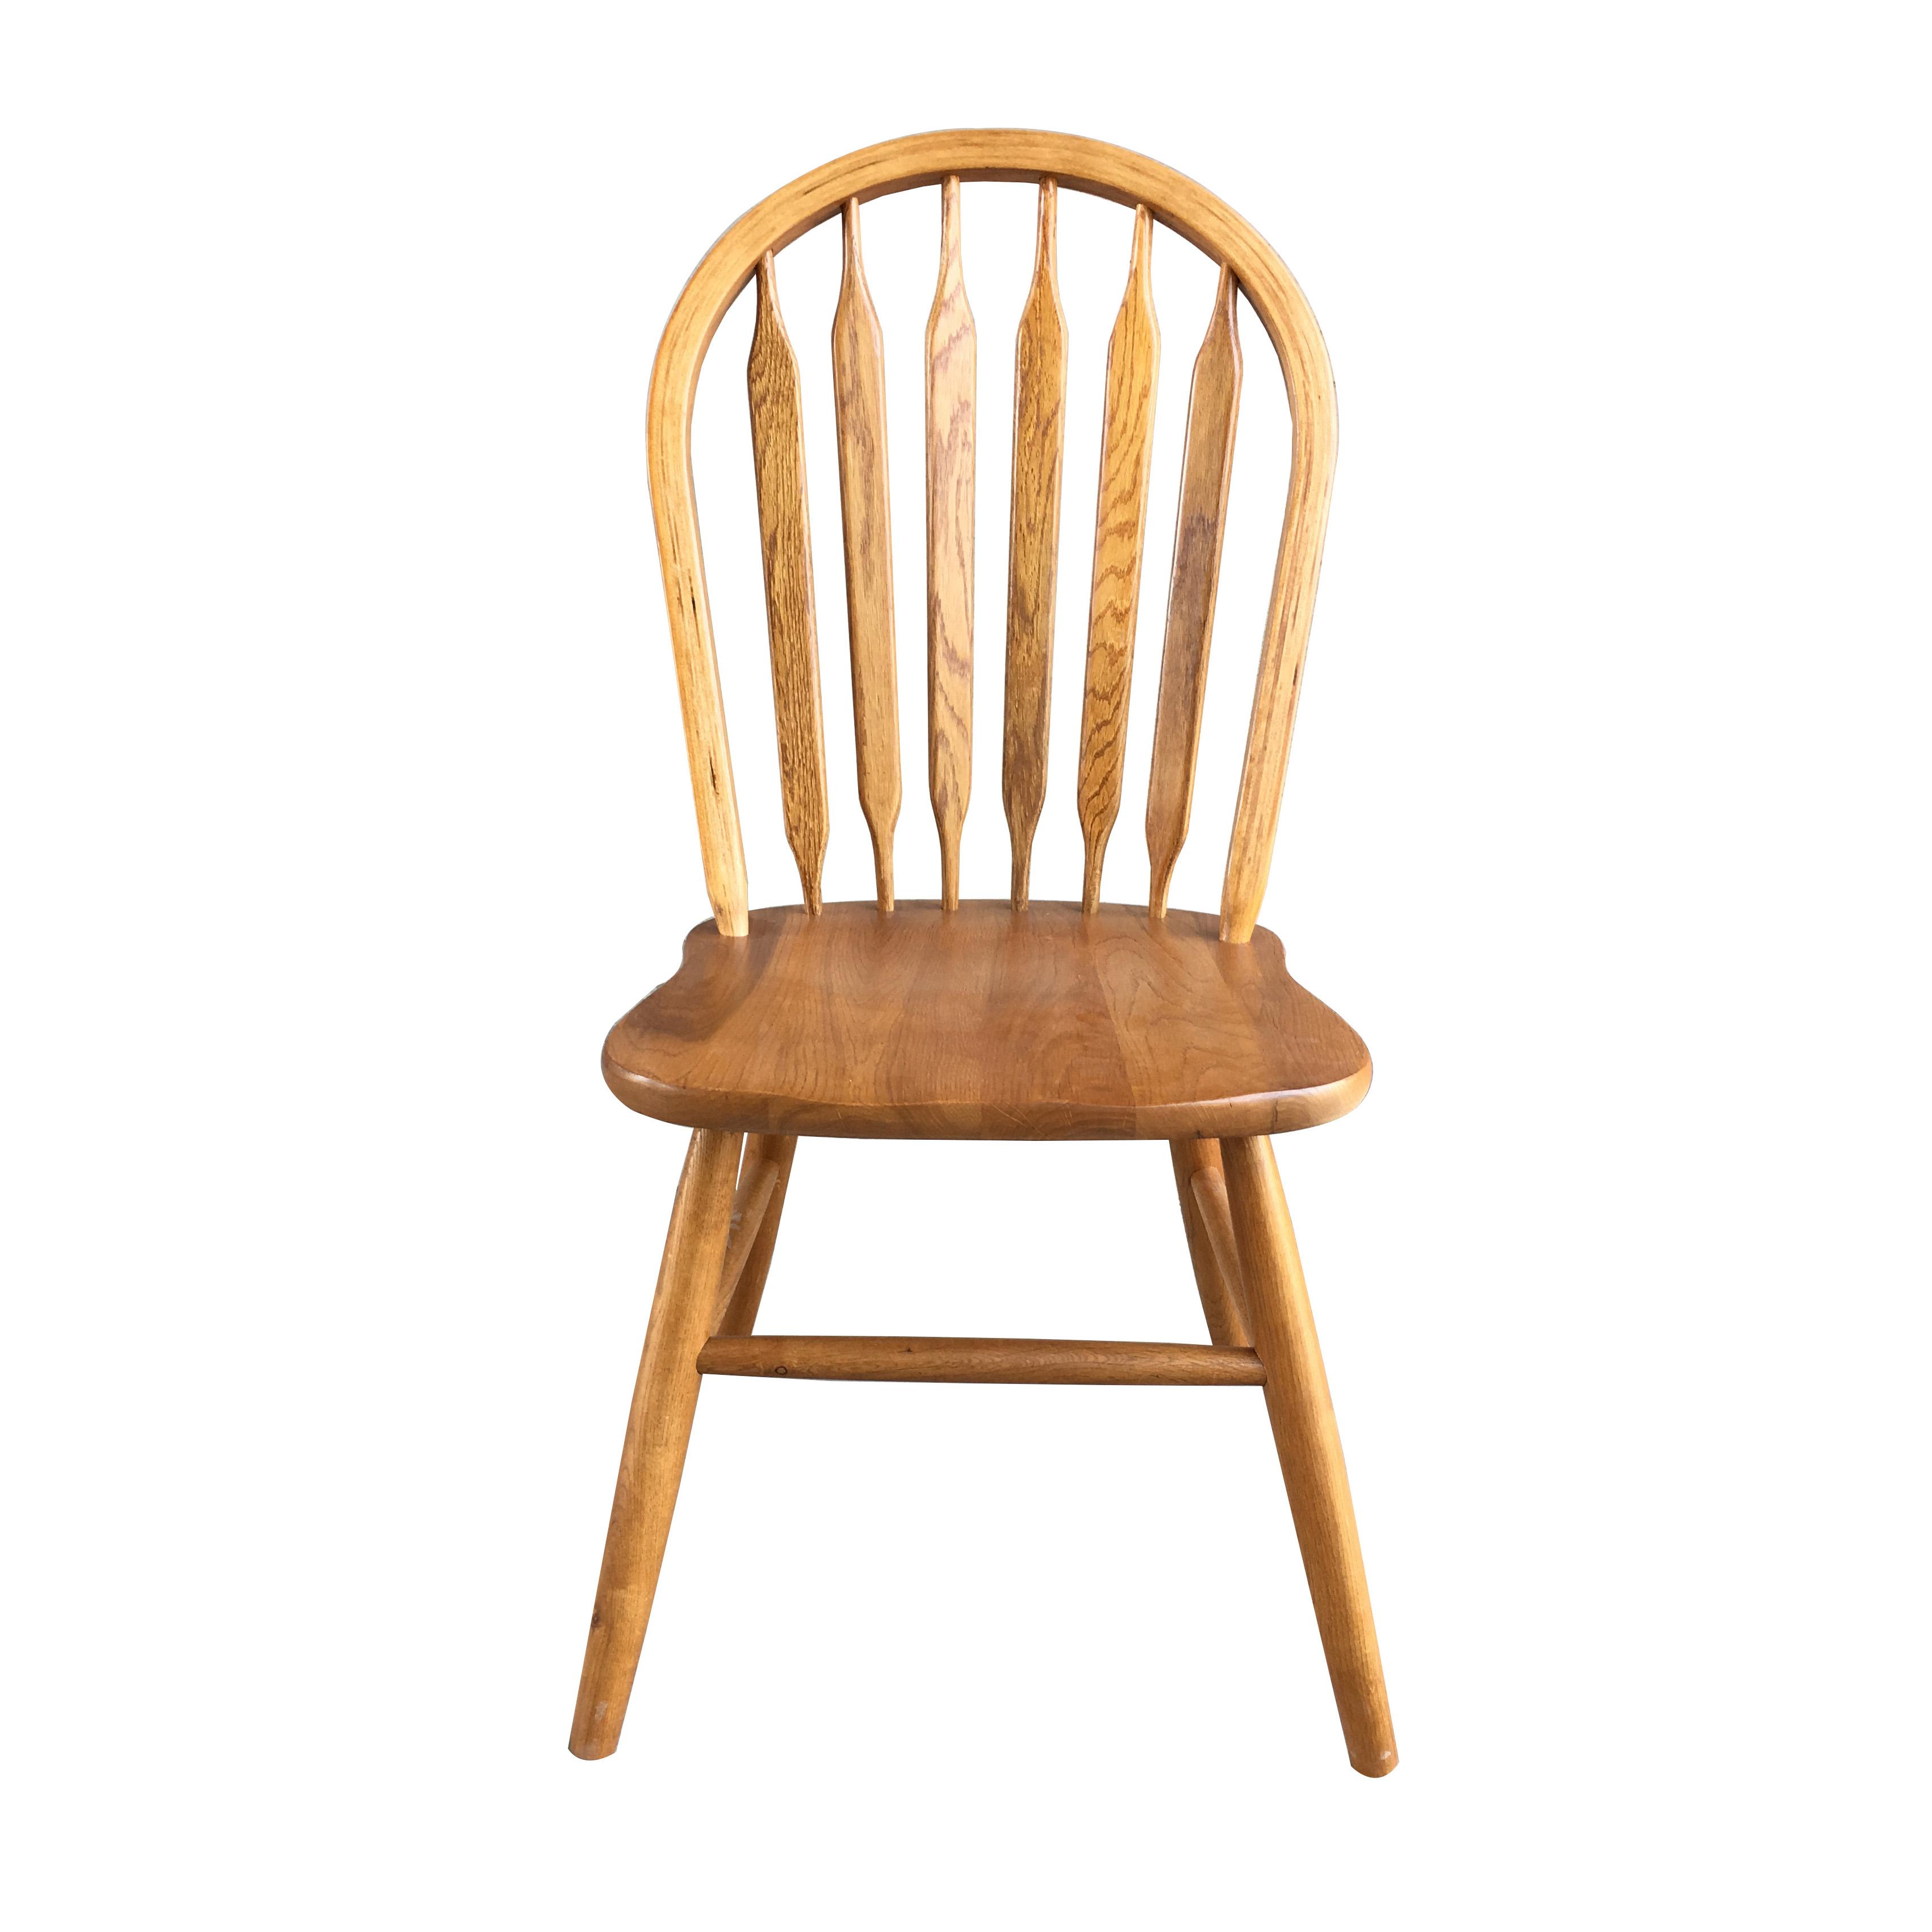 Arrowback Side Chair Tennessee Enterprises, Inc